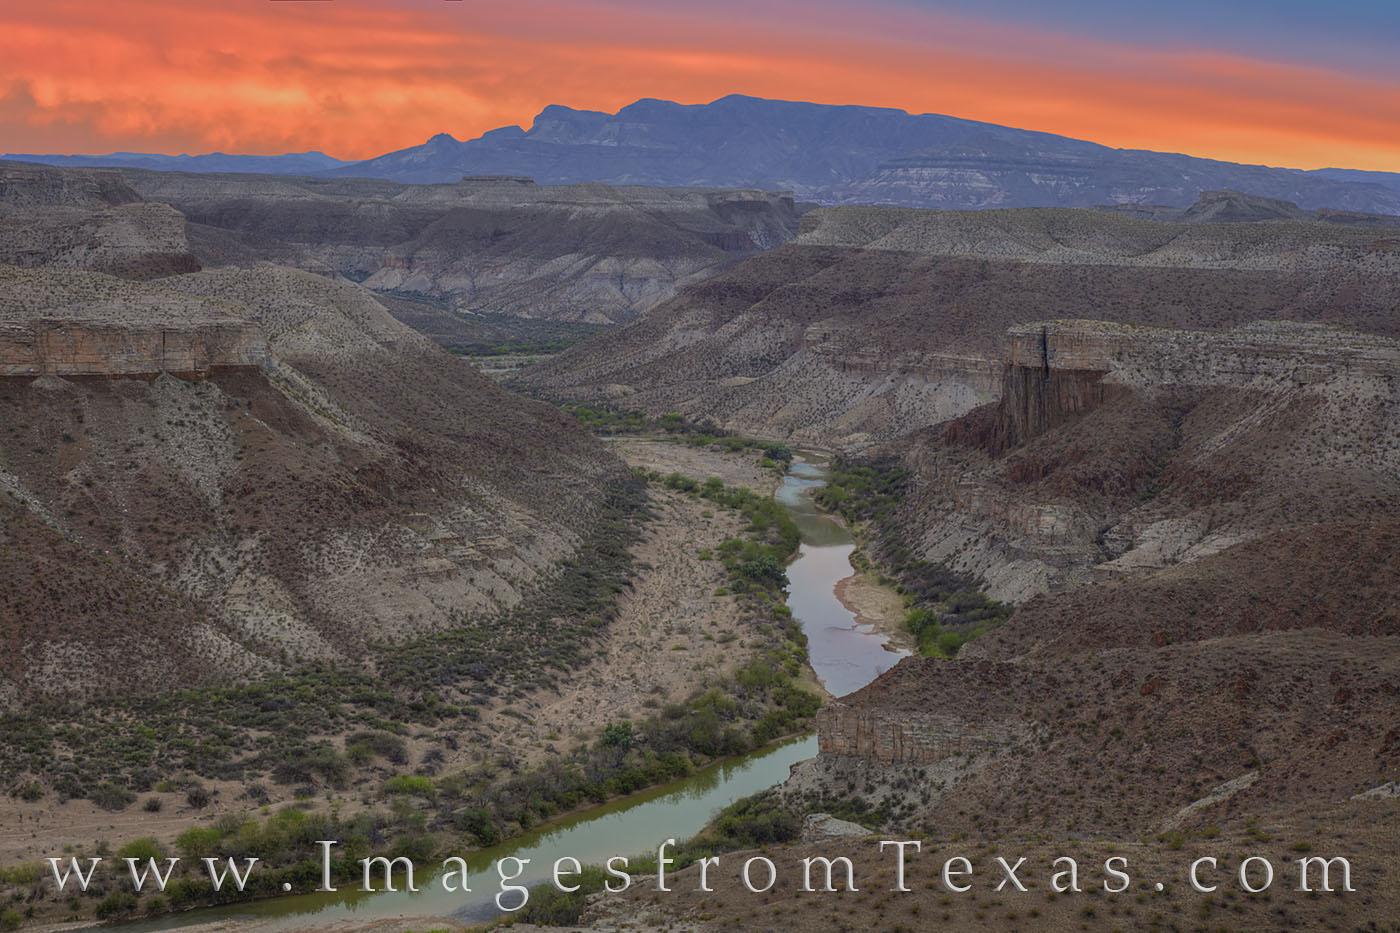 Mesa de anguila, rio grande, big bend, national park, sierra ponce, mesa, cliffs, orange, sunset, lajitas, hiking, remote, photo